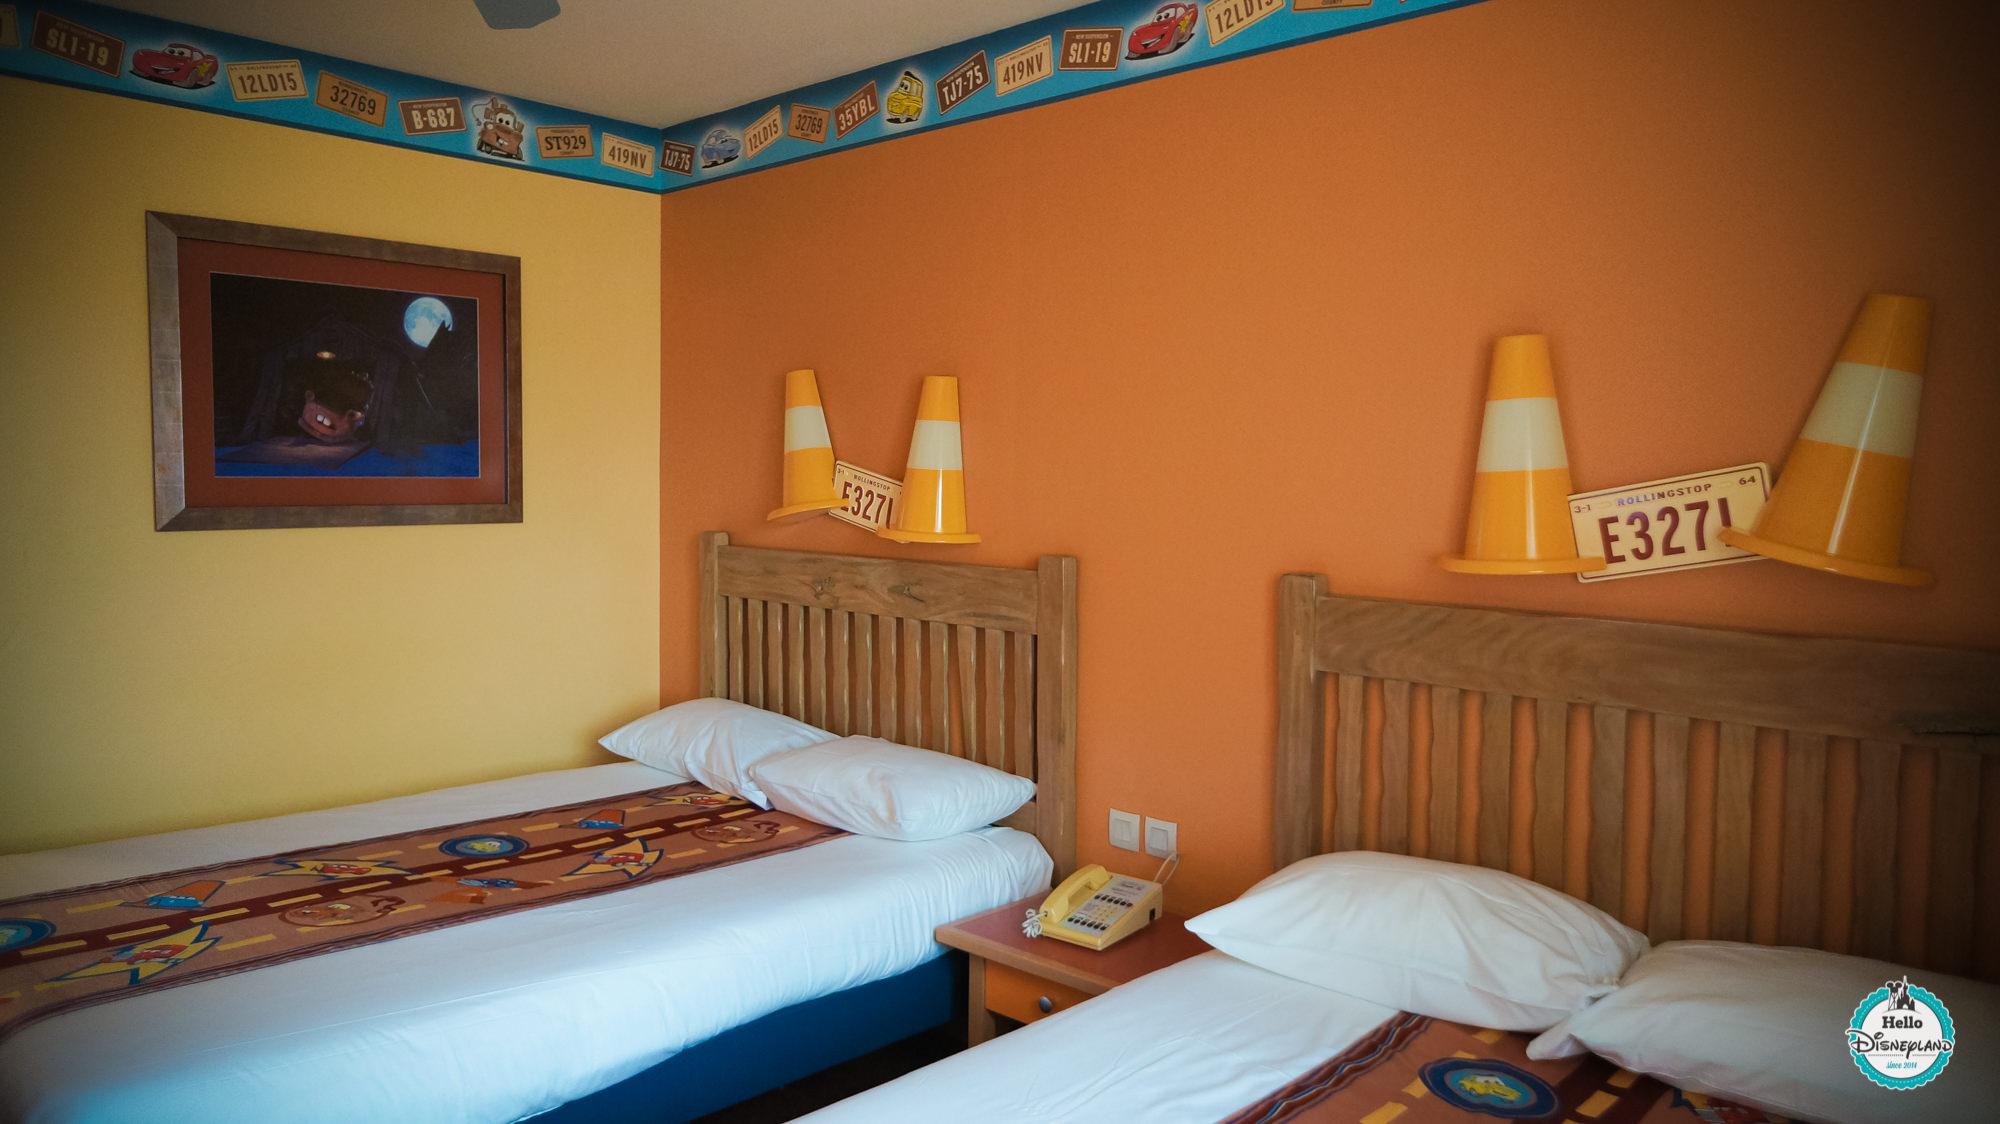 Salle De Bain Hotel Cheyenne Disney ~ hello disneyland le blog n 1 sur disneyland paris disney s hotel